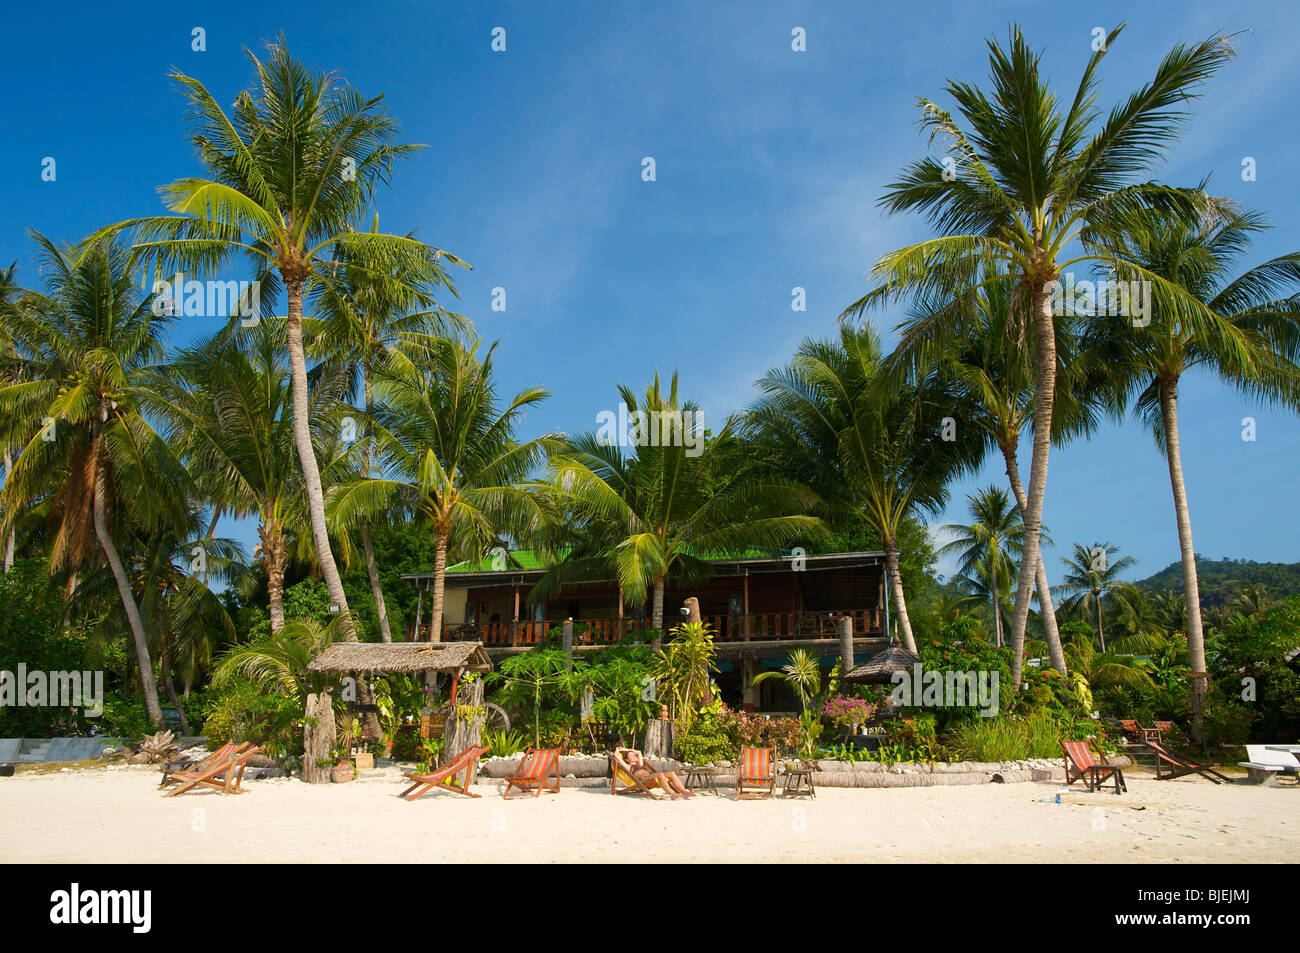 Palm beach, Ko Samui, Thailand - Stock Image